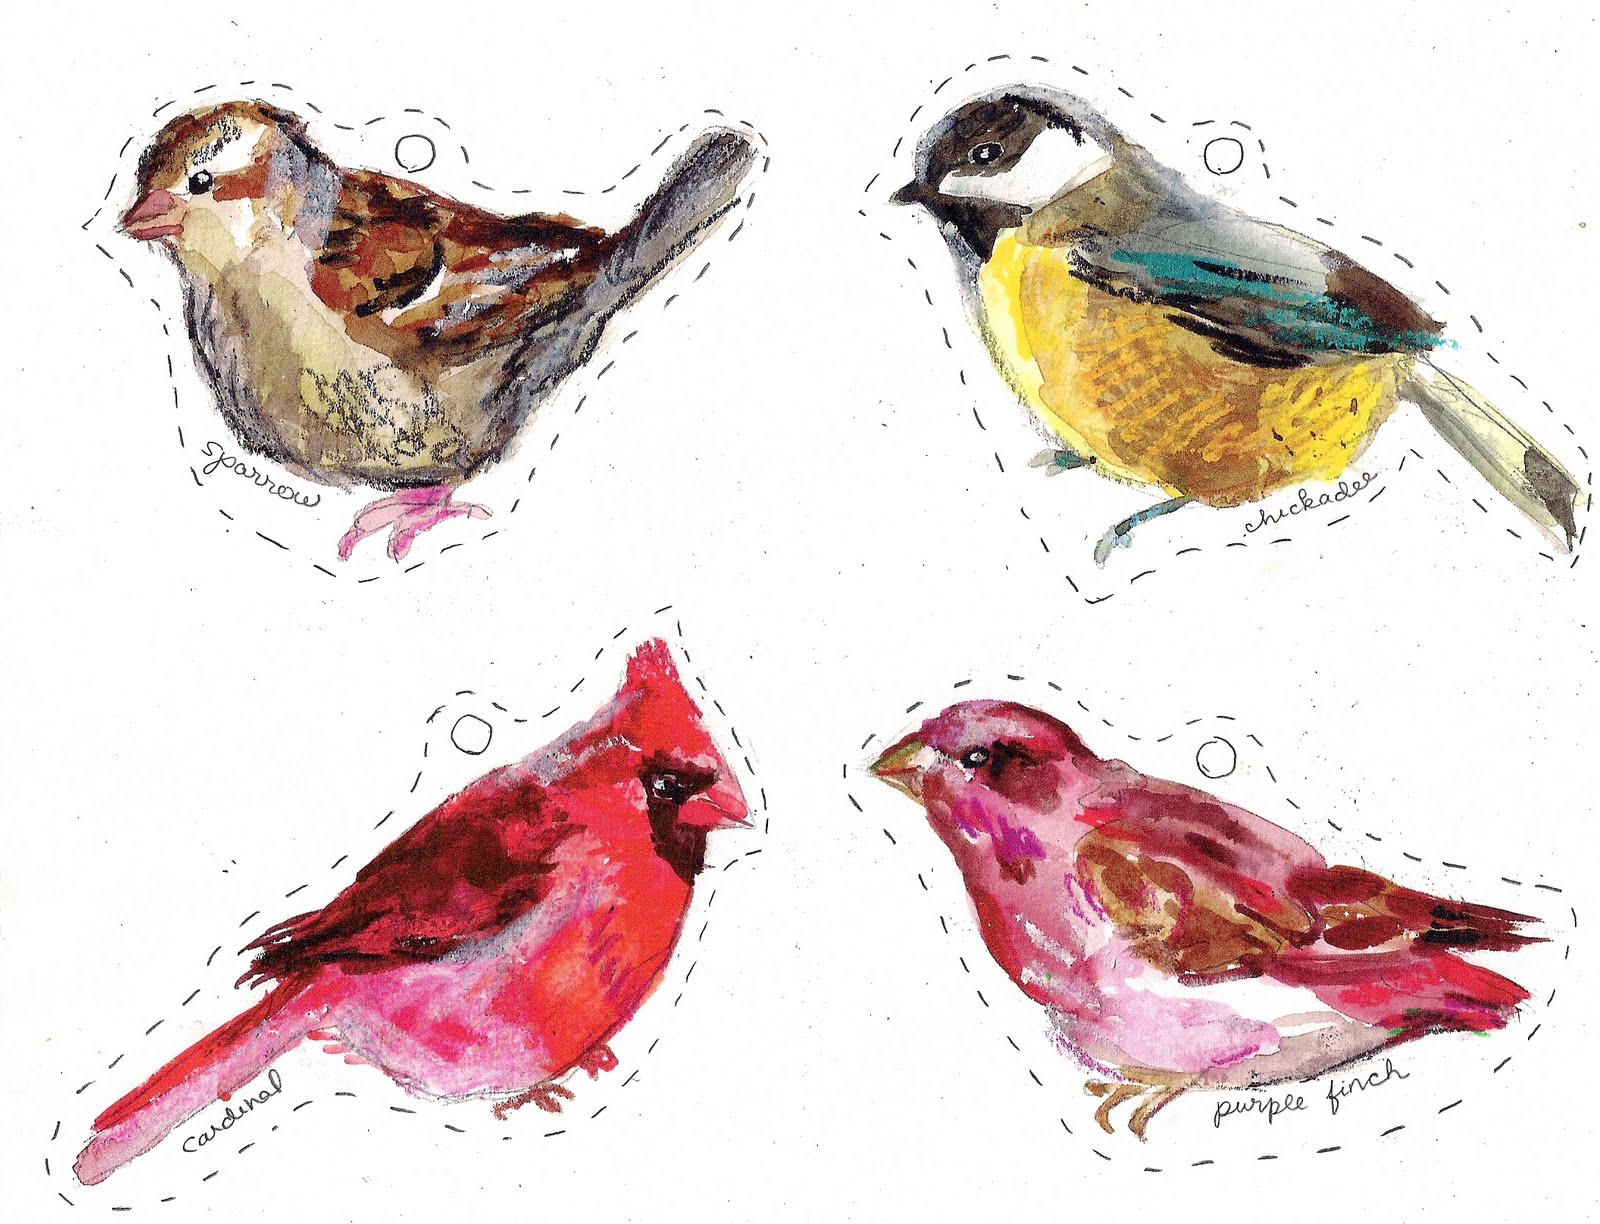 Printable Pics Of Birds With Winter Birds Free Printables Making It - Free Printable Images Of Birds